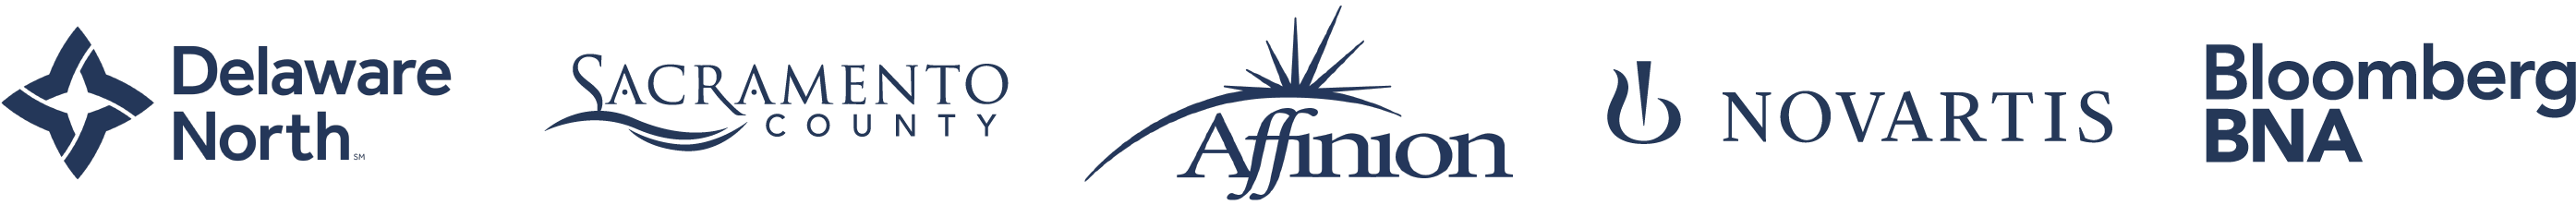 Bande de logos de Delaware North, de Sacramento County, d'Affinion, de Novartis et de Bloomberg BNA